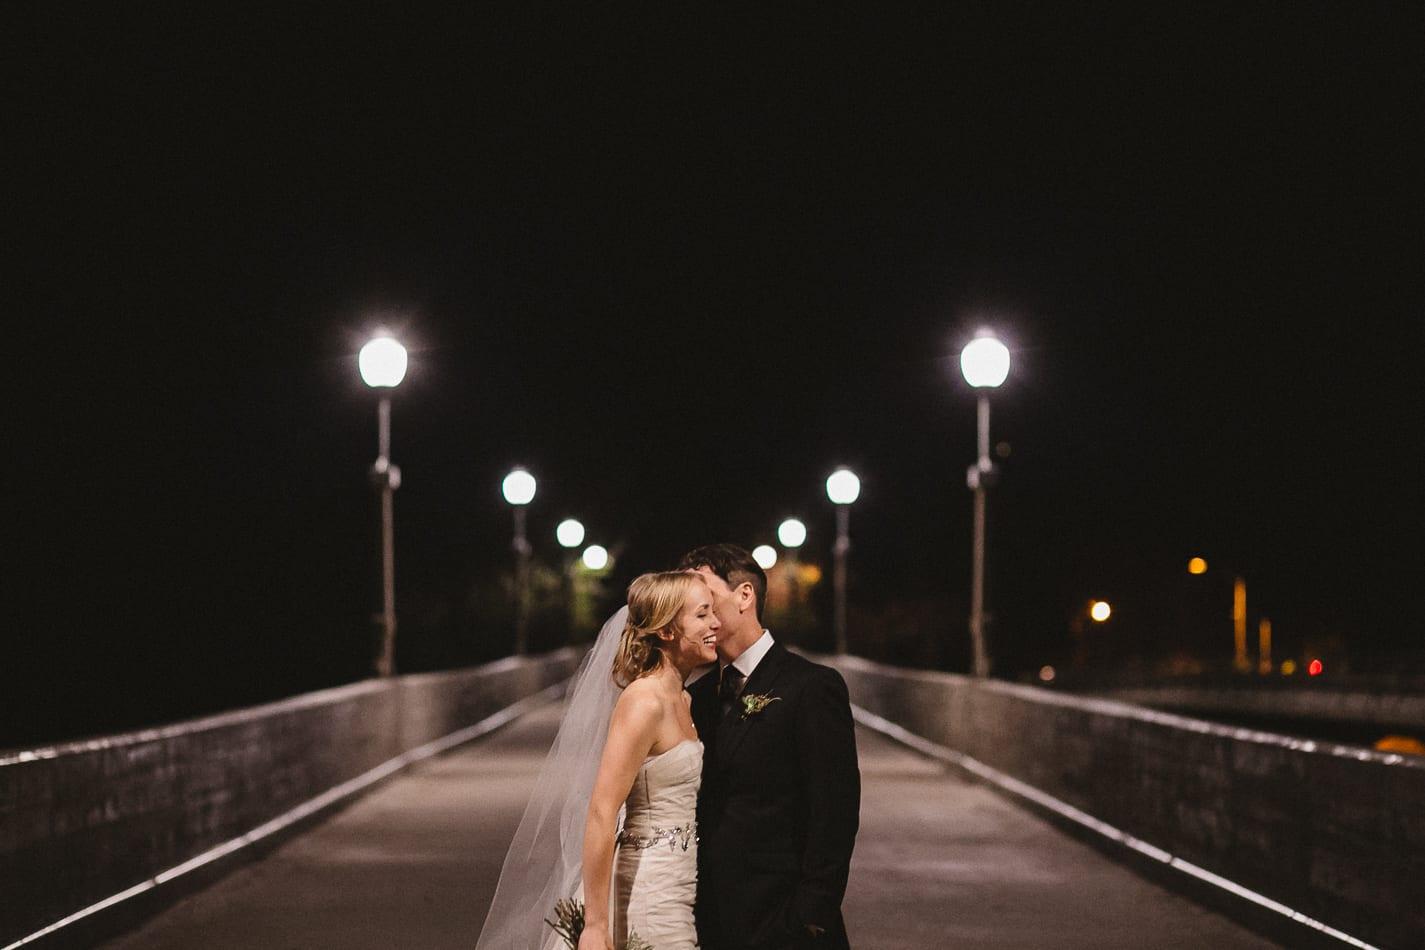 lake-redding-park-diesel-horse-bridge-view202-california-wedding-photographer-24